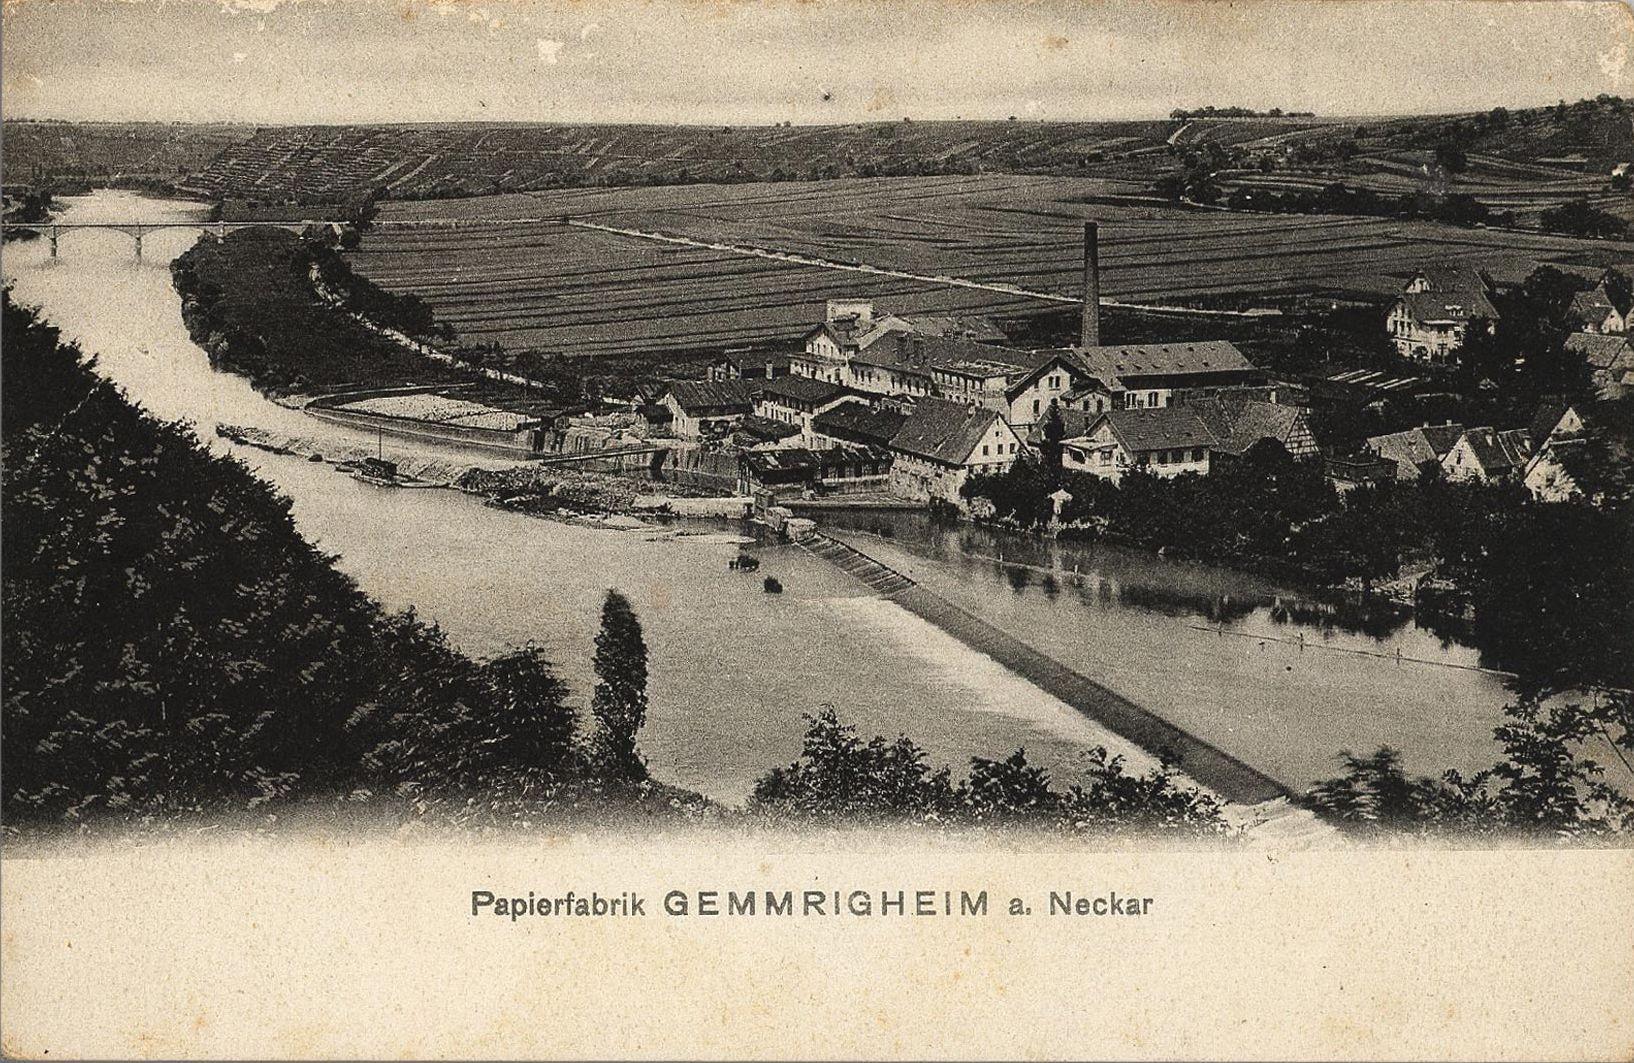 Ansichtskarte der Papierfabrik Gemmrigheim am Neckar